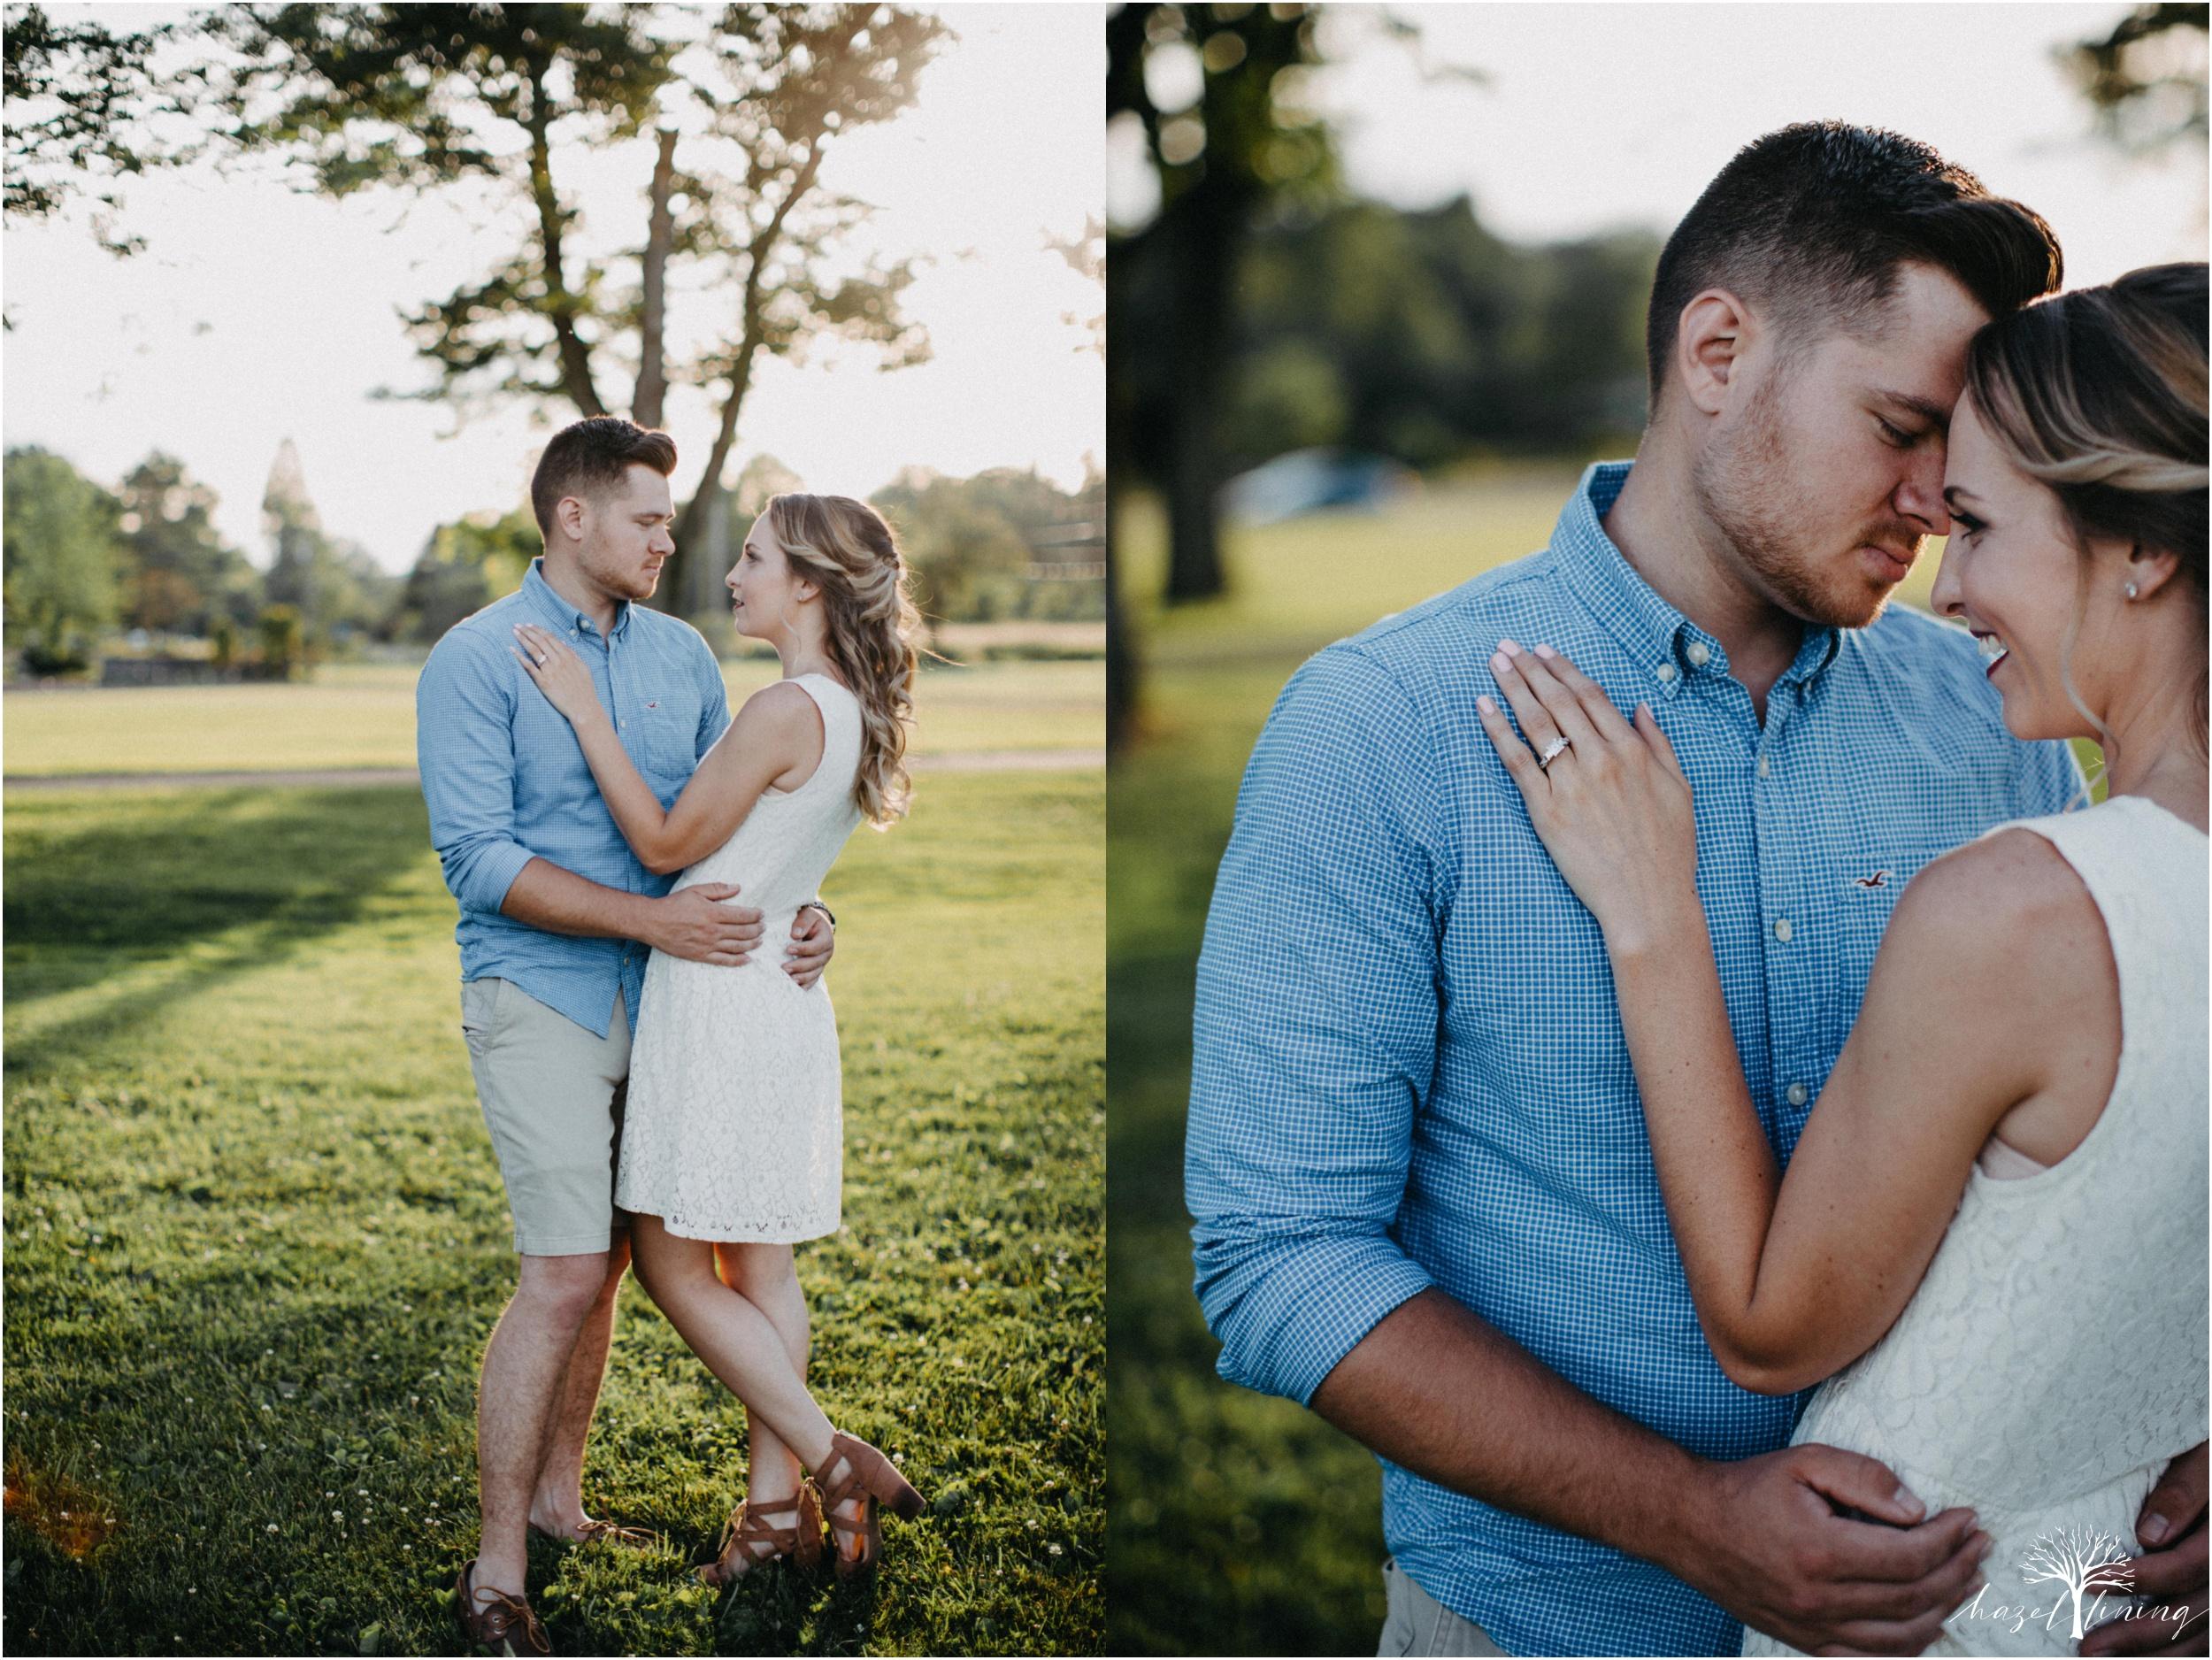 rachel-warner-chris-niedrist-the-farm-bakery-and-events-quakertown-pa-summer-engagement-hazel-lining-photography-destination-elopement-wedding-engagement-photography_0024.jpg